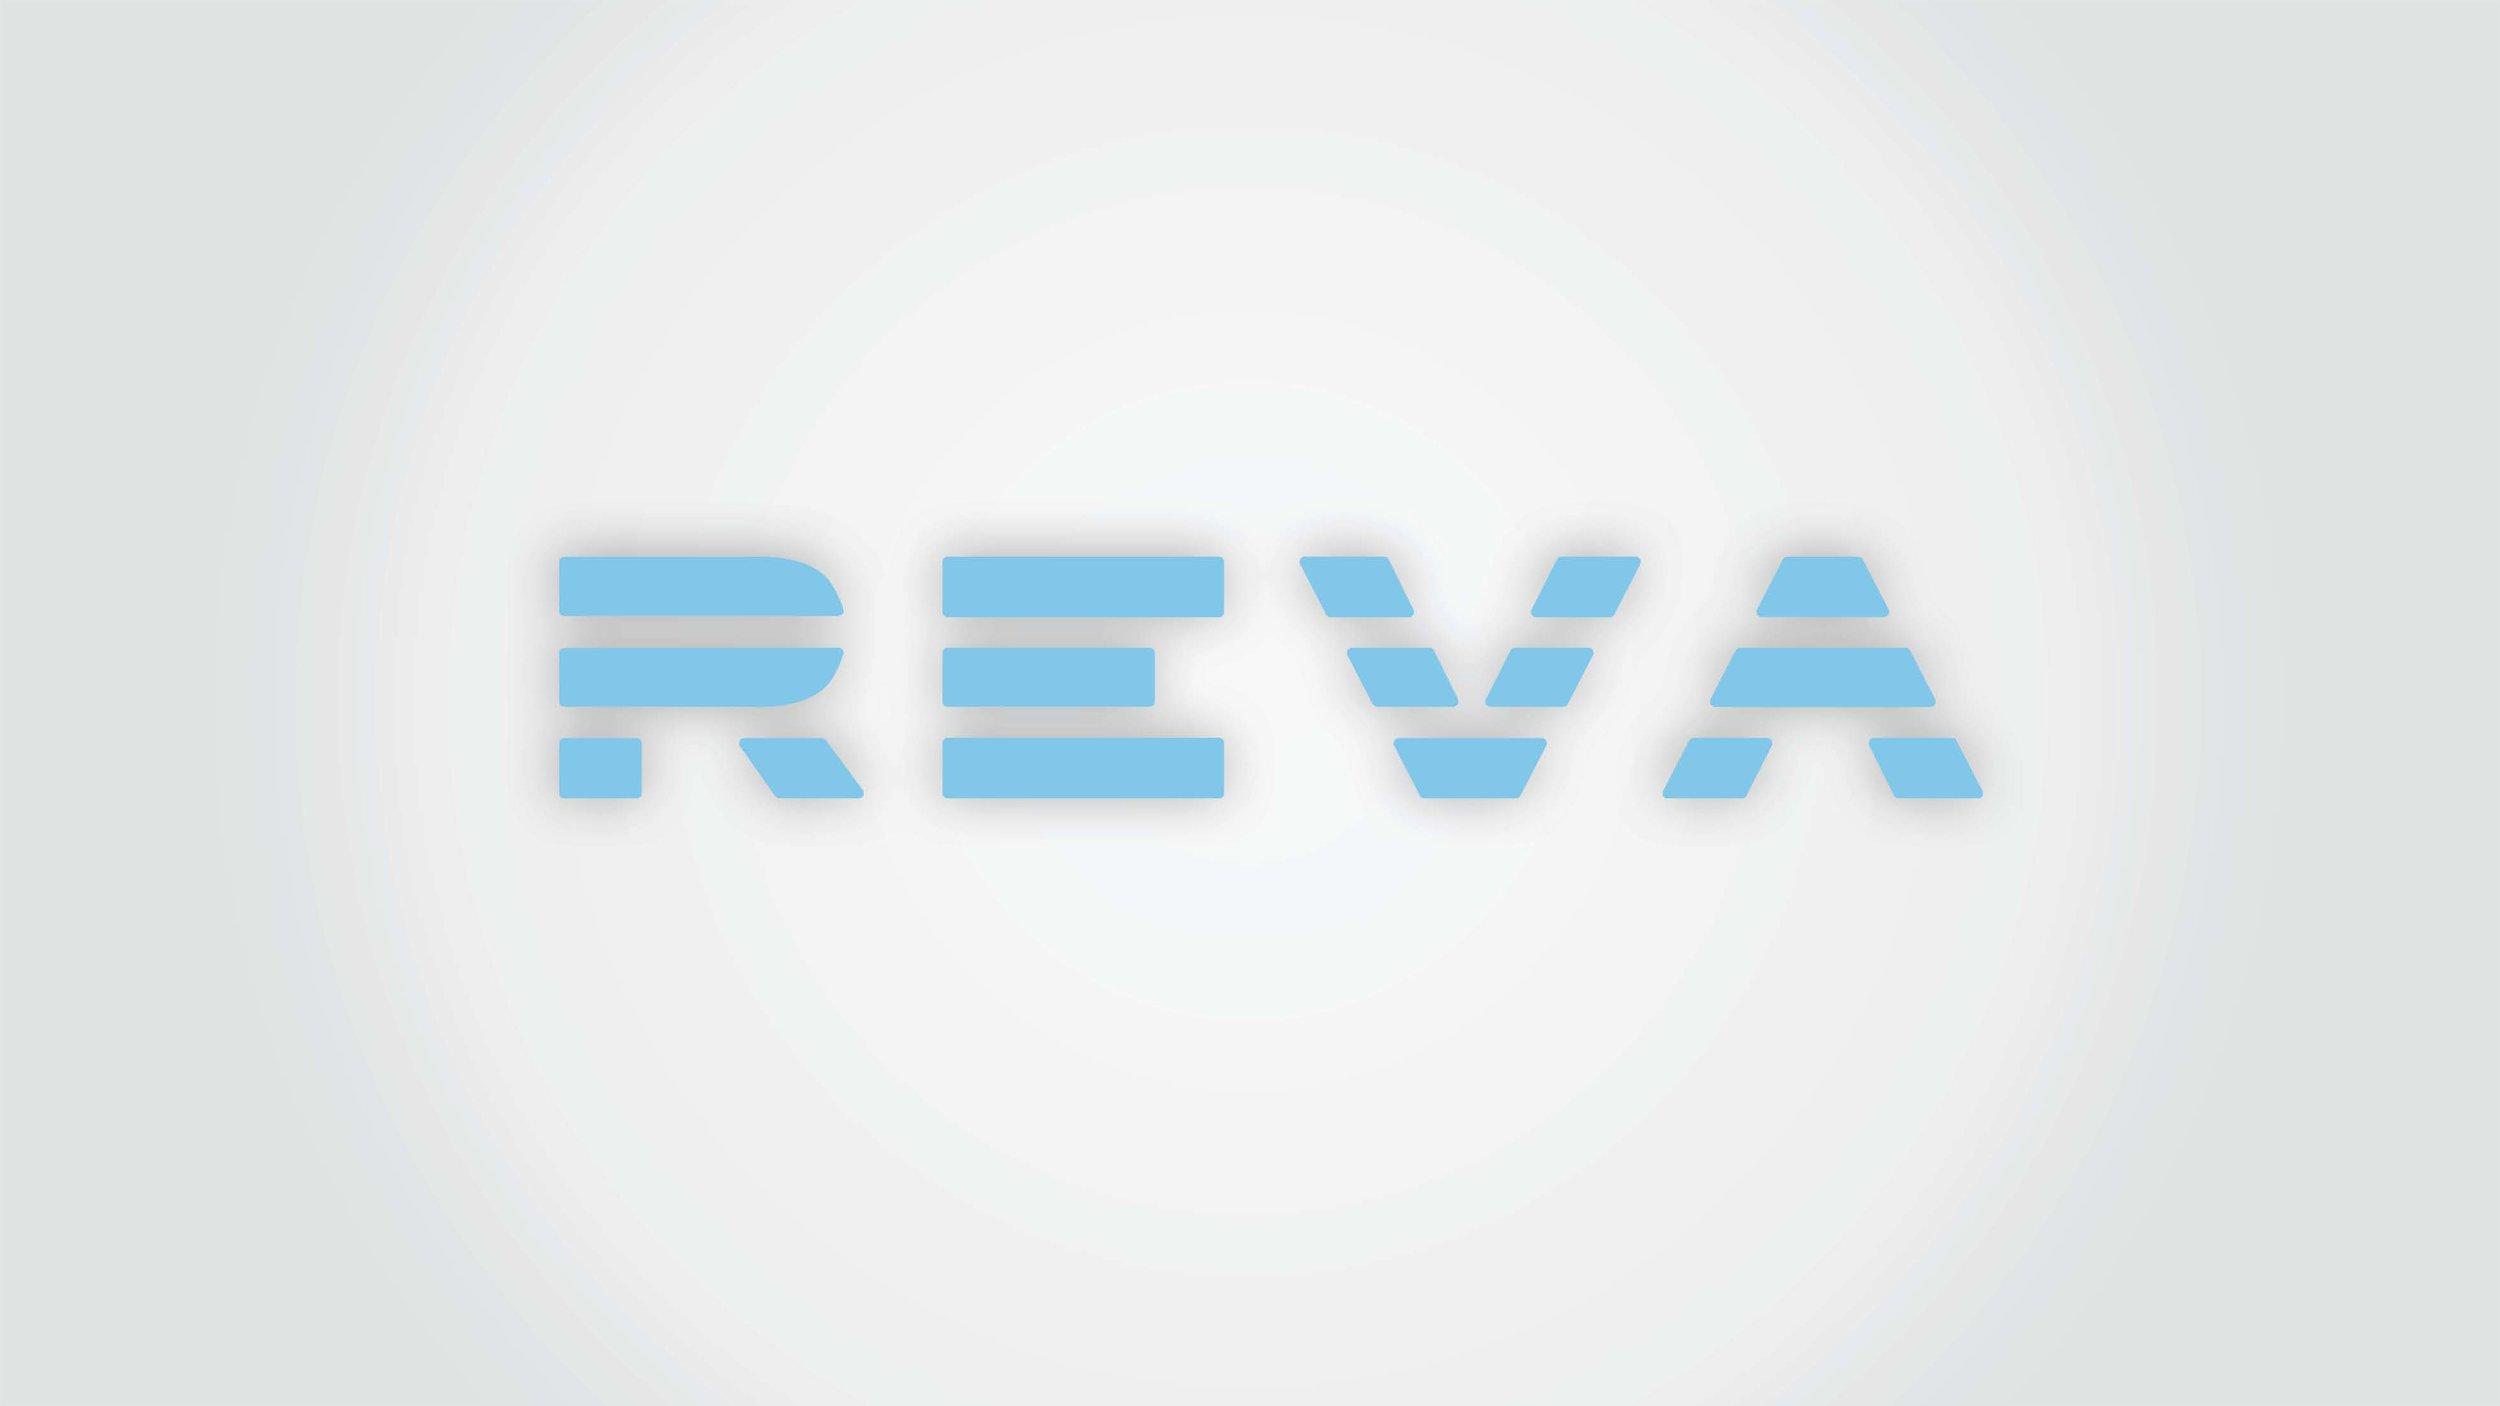 Reva_Demo Day Pitch Deck_08162018_Page_12.jpg